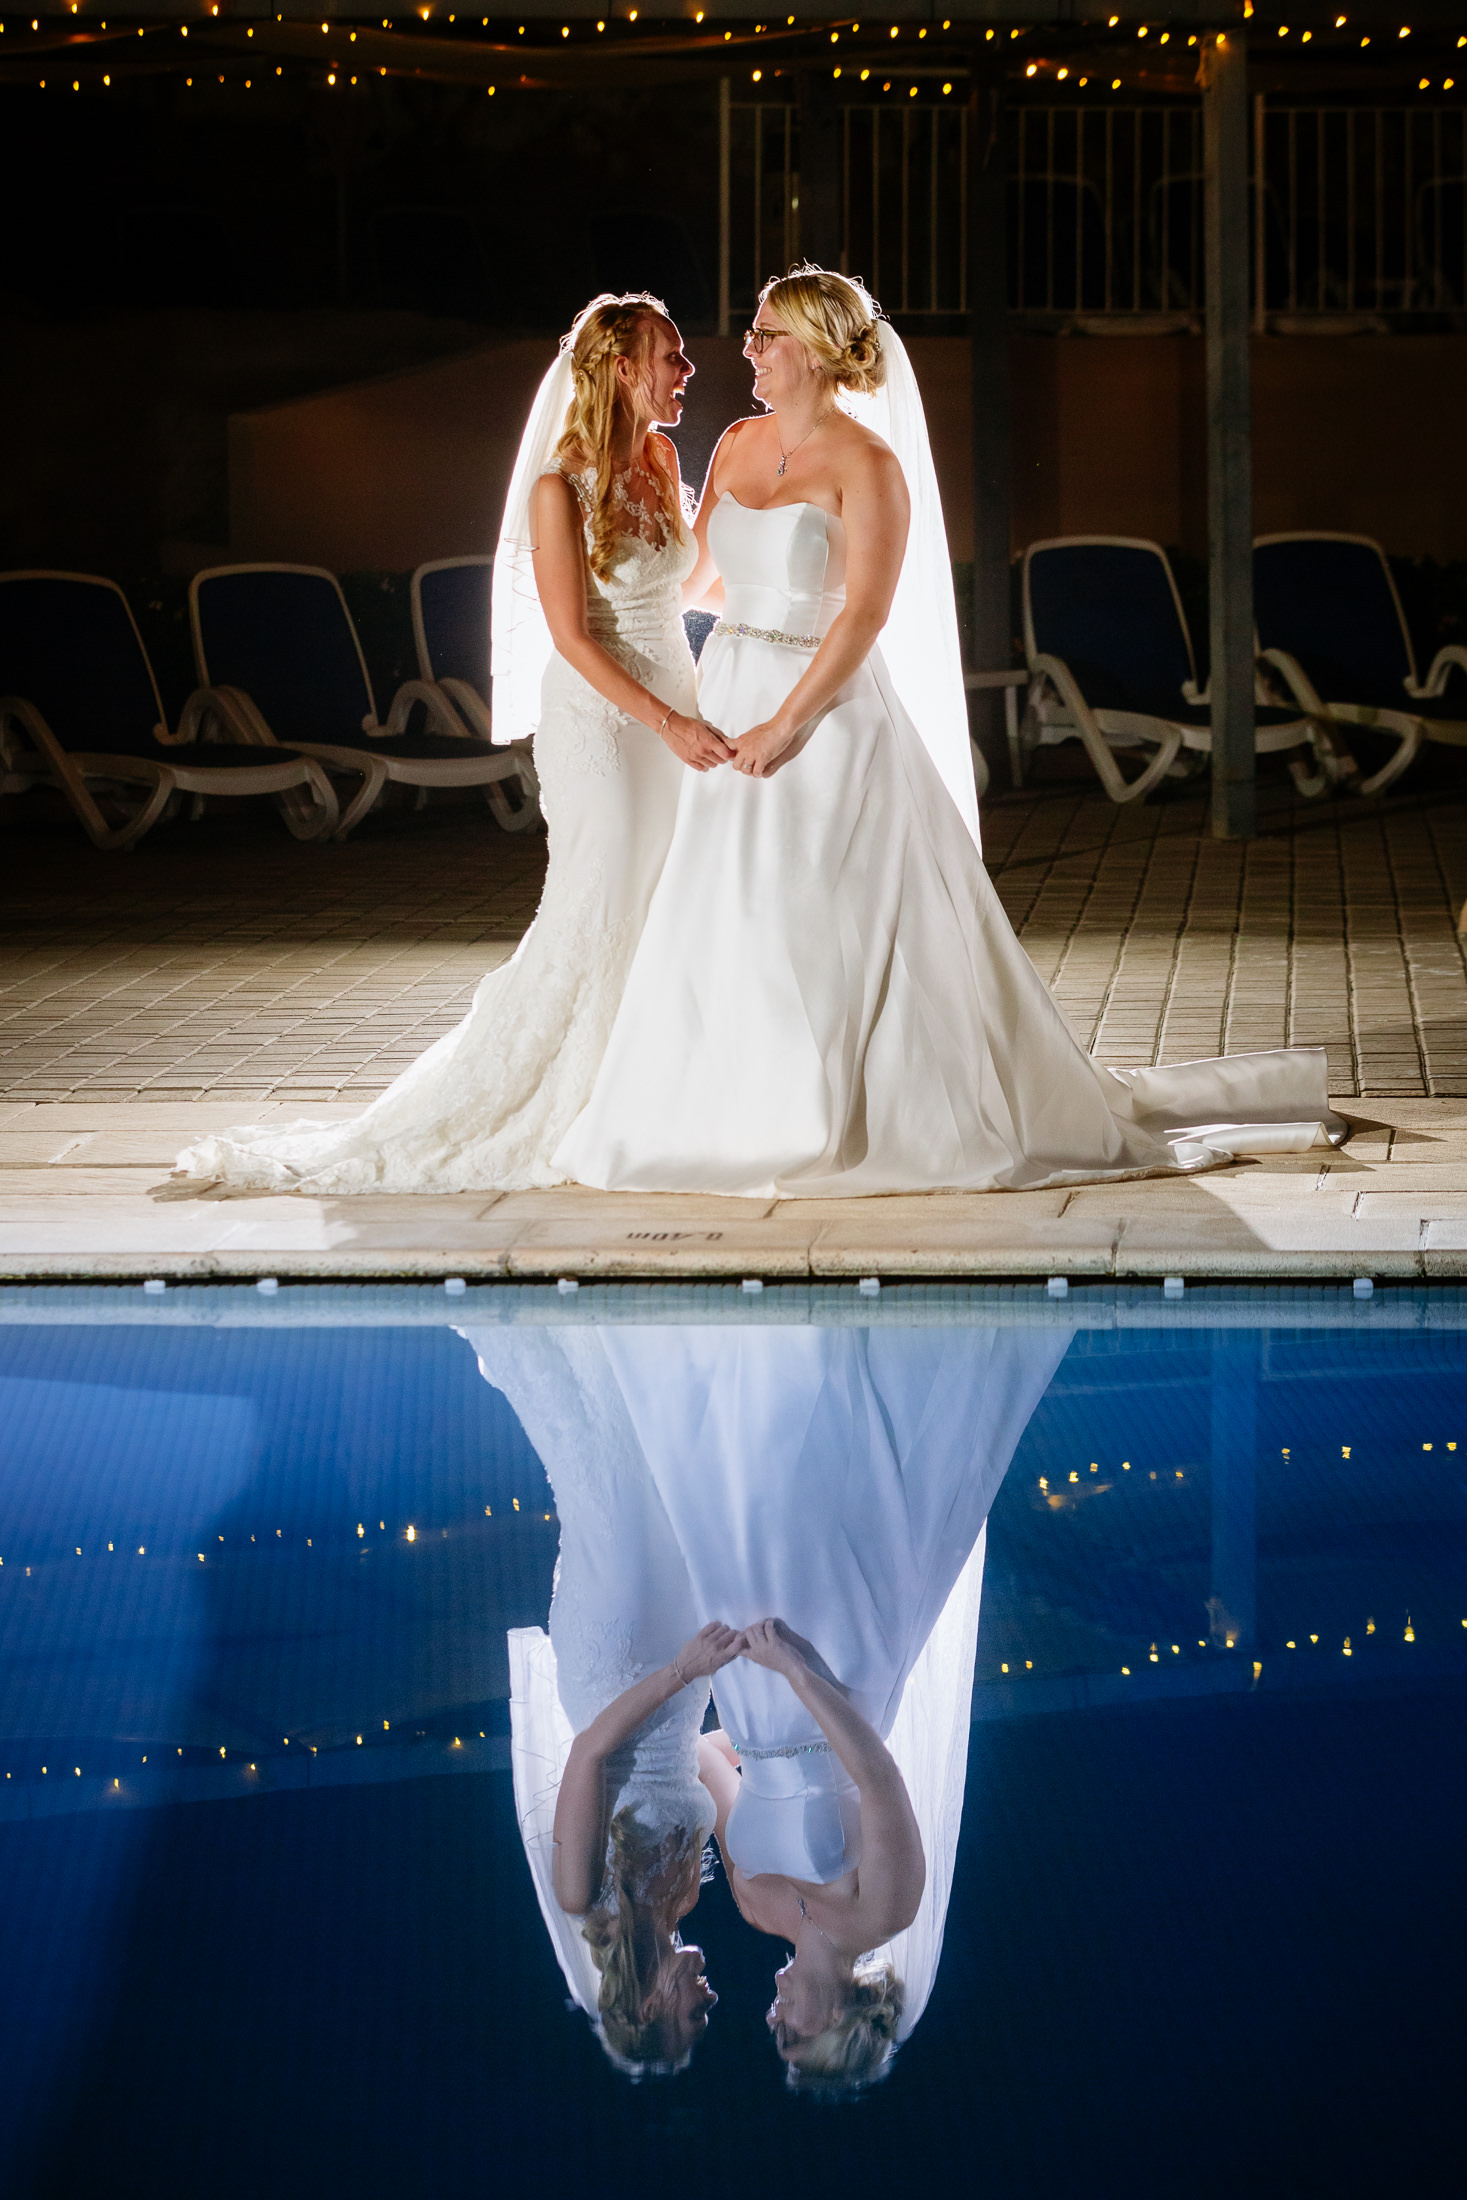 Malta_wedding_photography-119.jpg